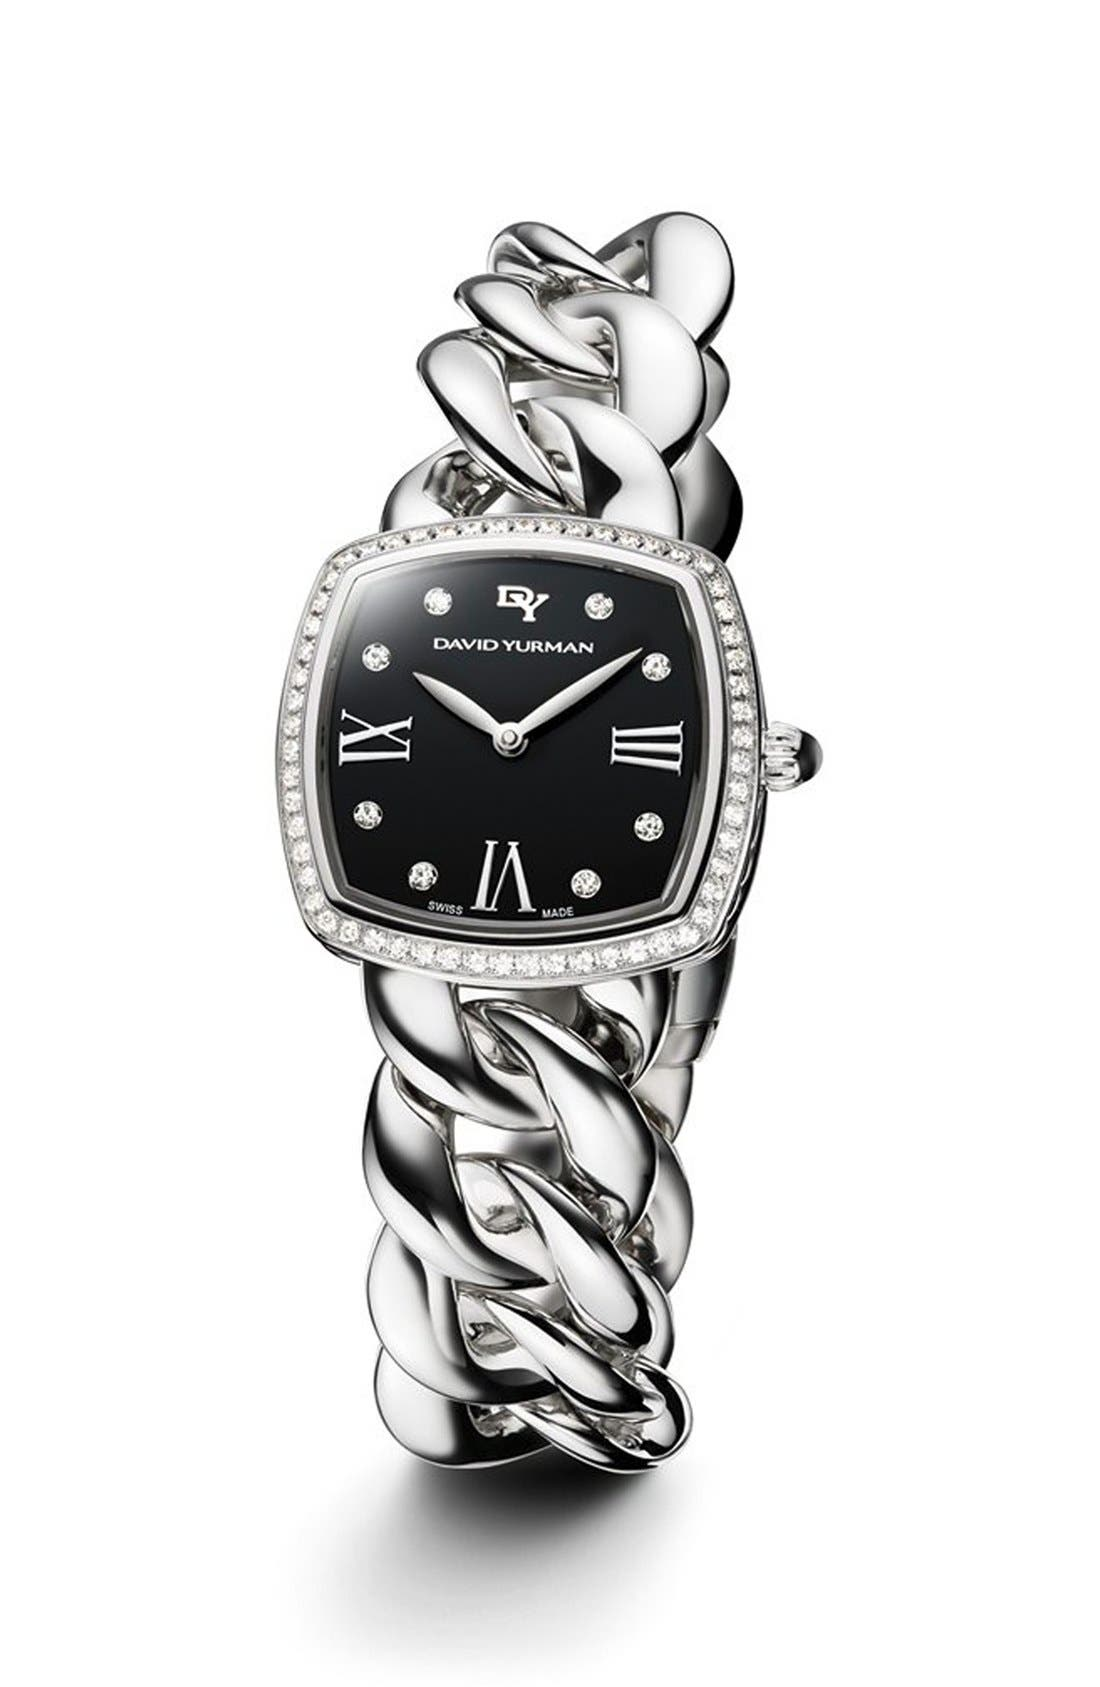 Main Image - David Yurman 'Albion' 27mm Stainless Steel Quartz Watch with Diamonds